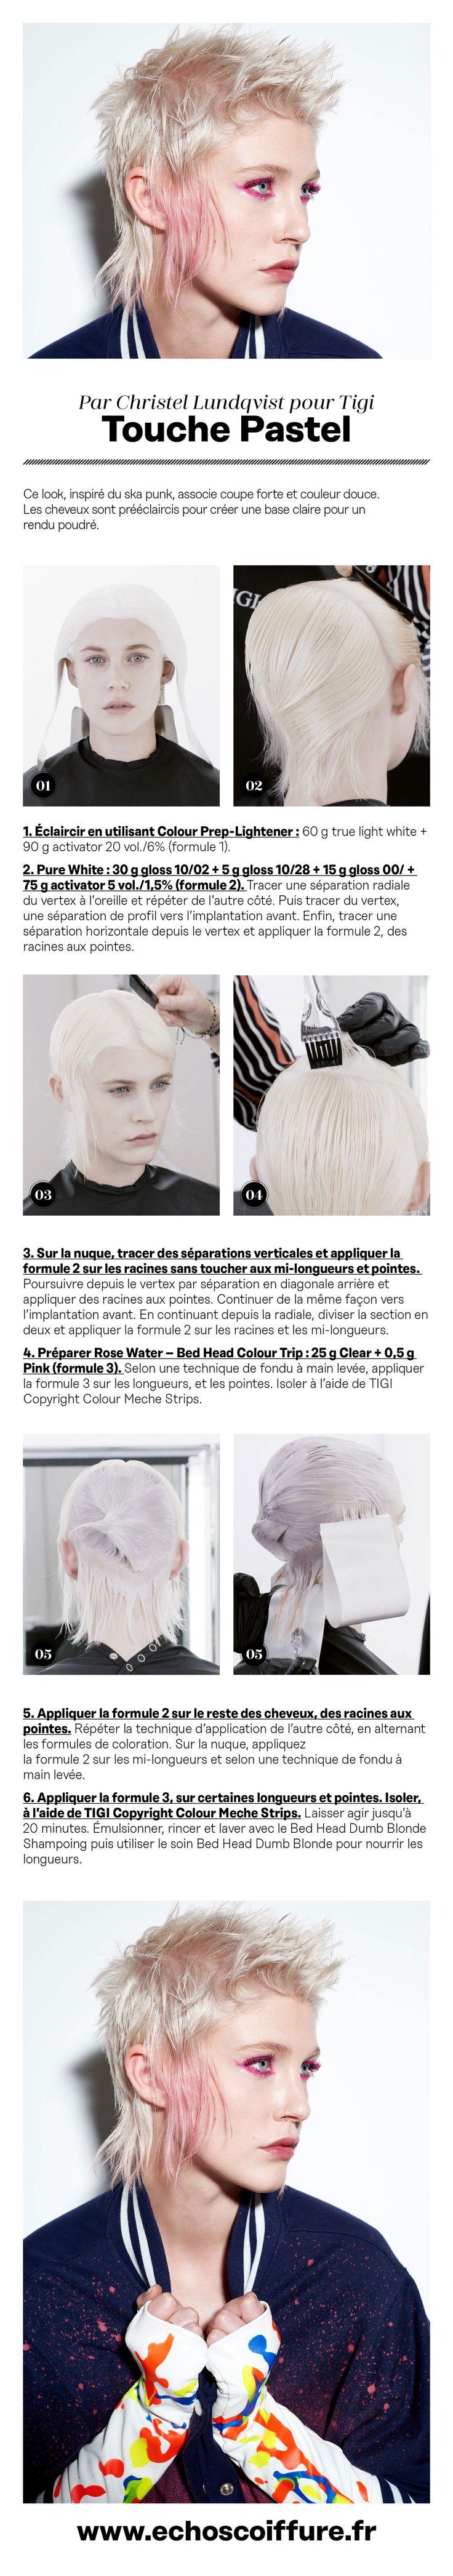 #Tuto #coloration #Cheveux #hair #coiffeur #coiffure #Schwarzkopf